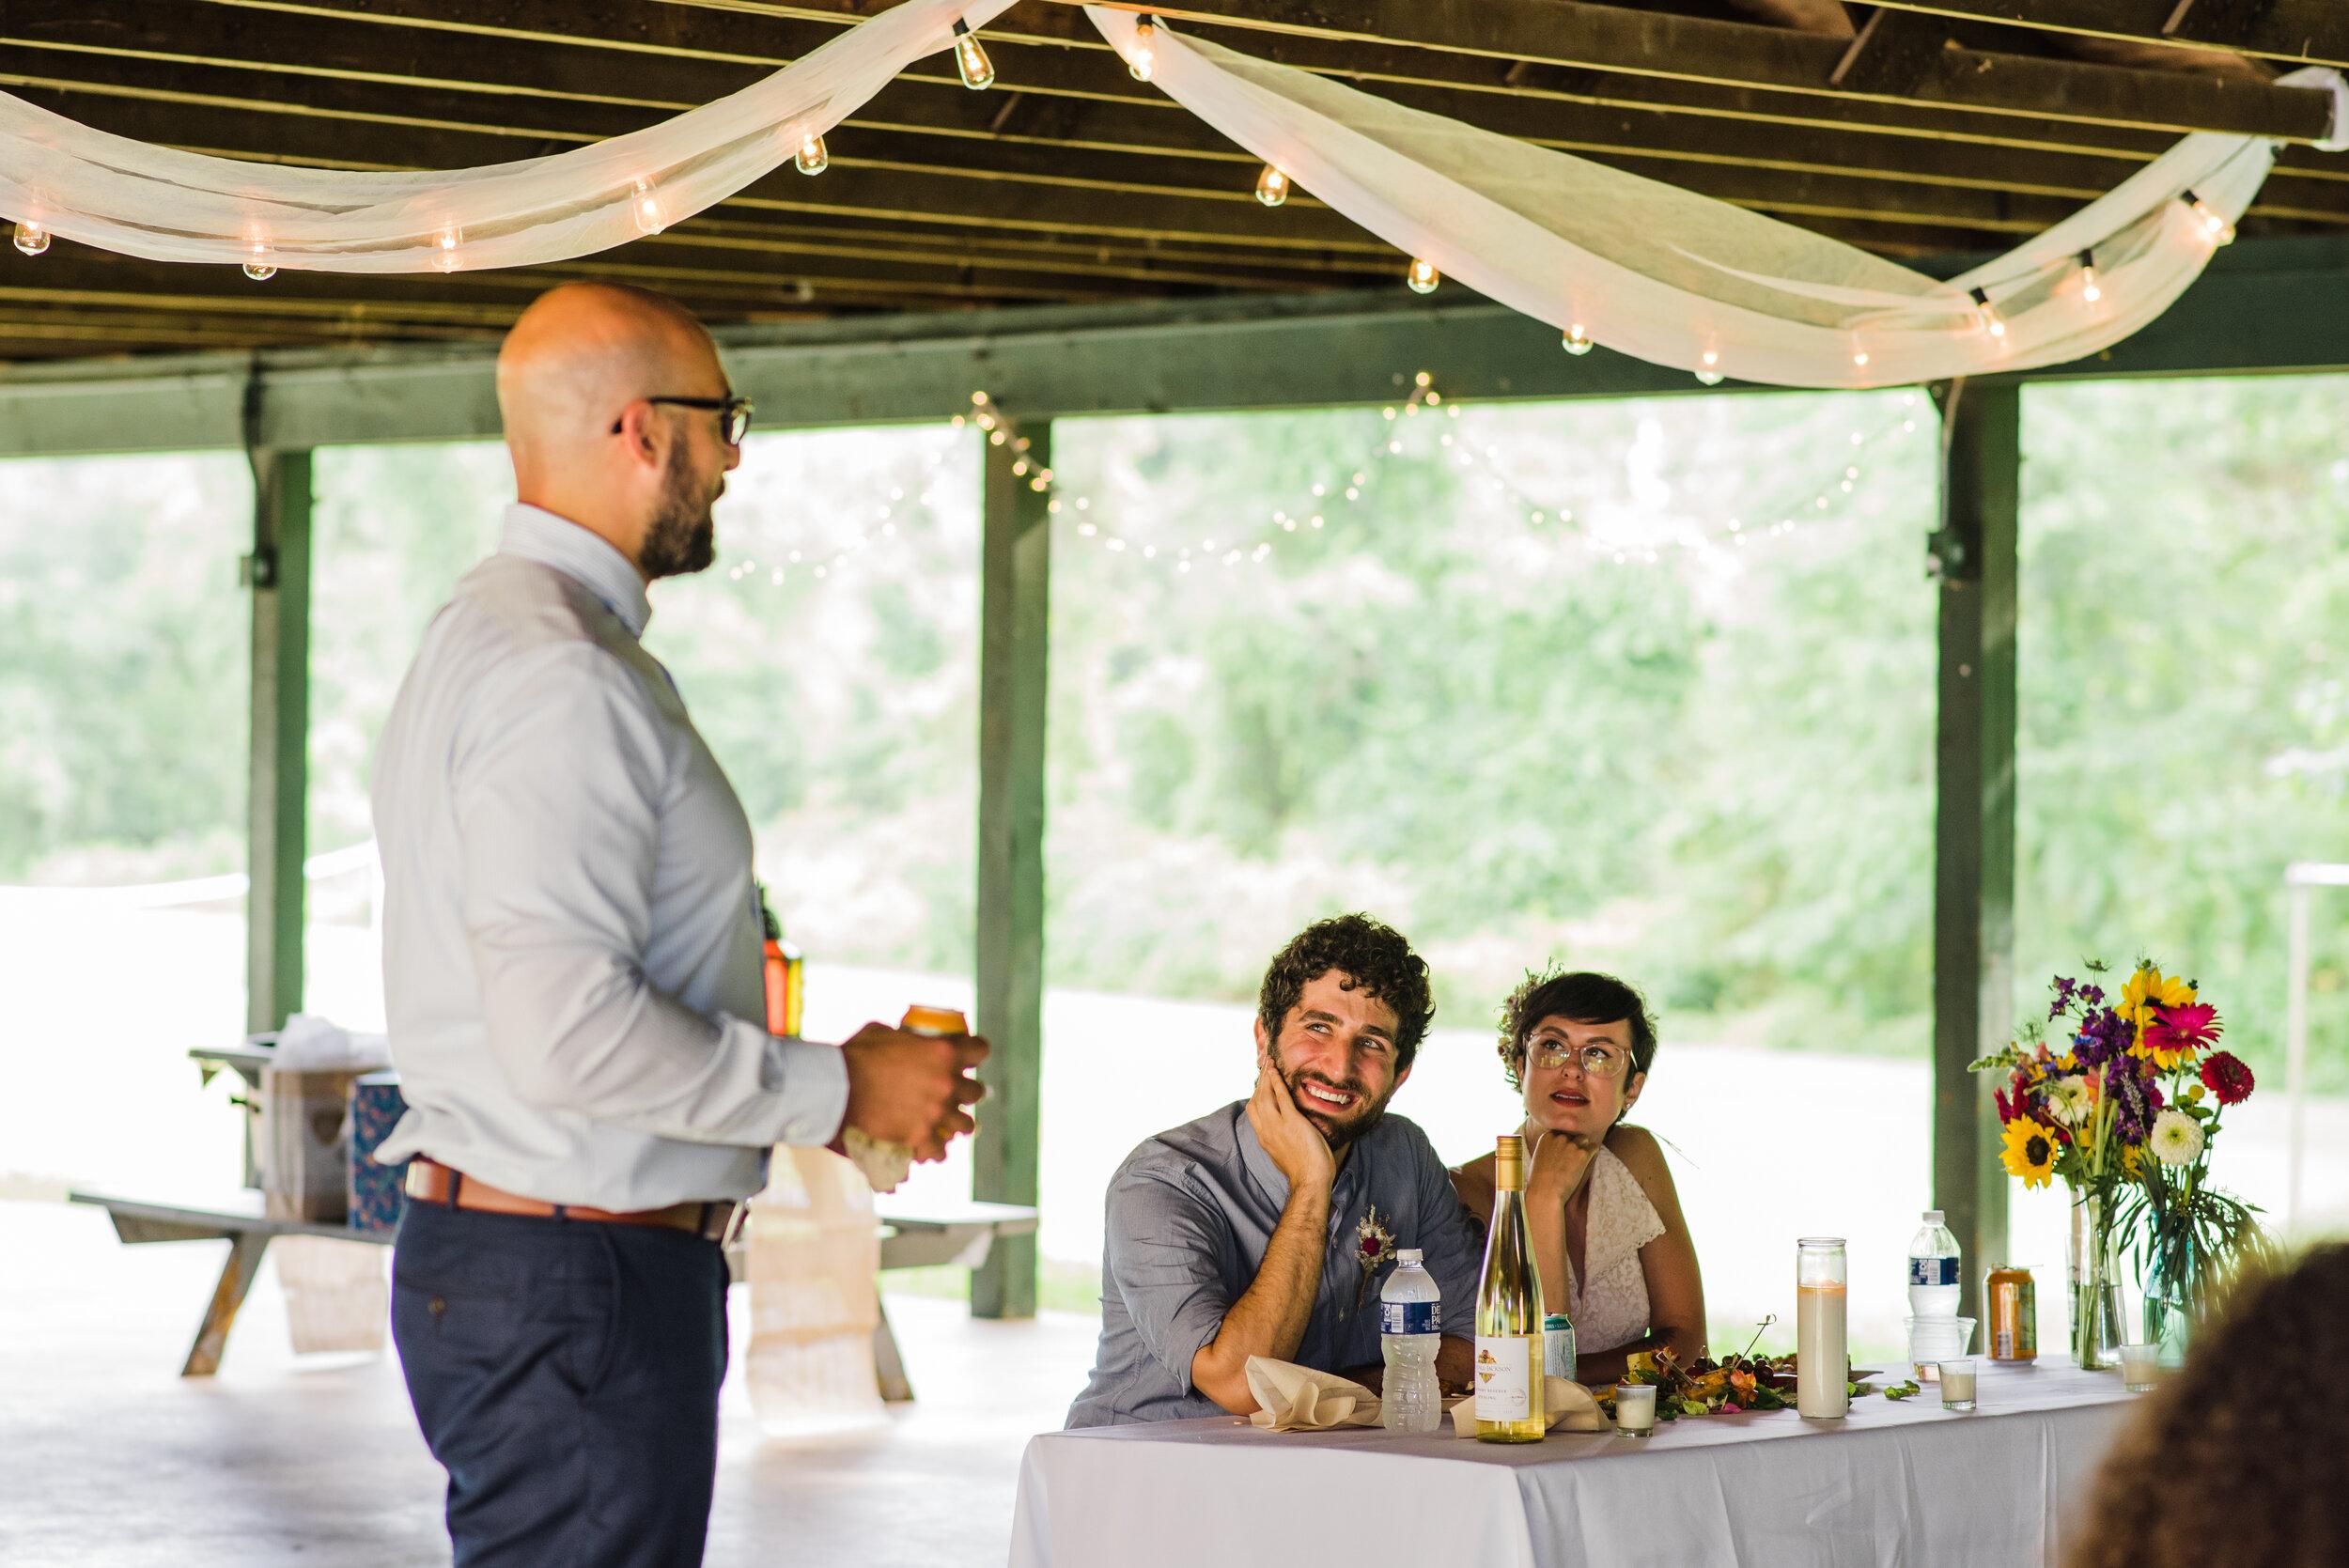 Couple's reaction during wedding speeches.